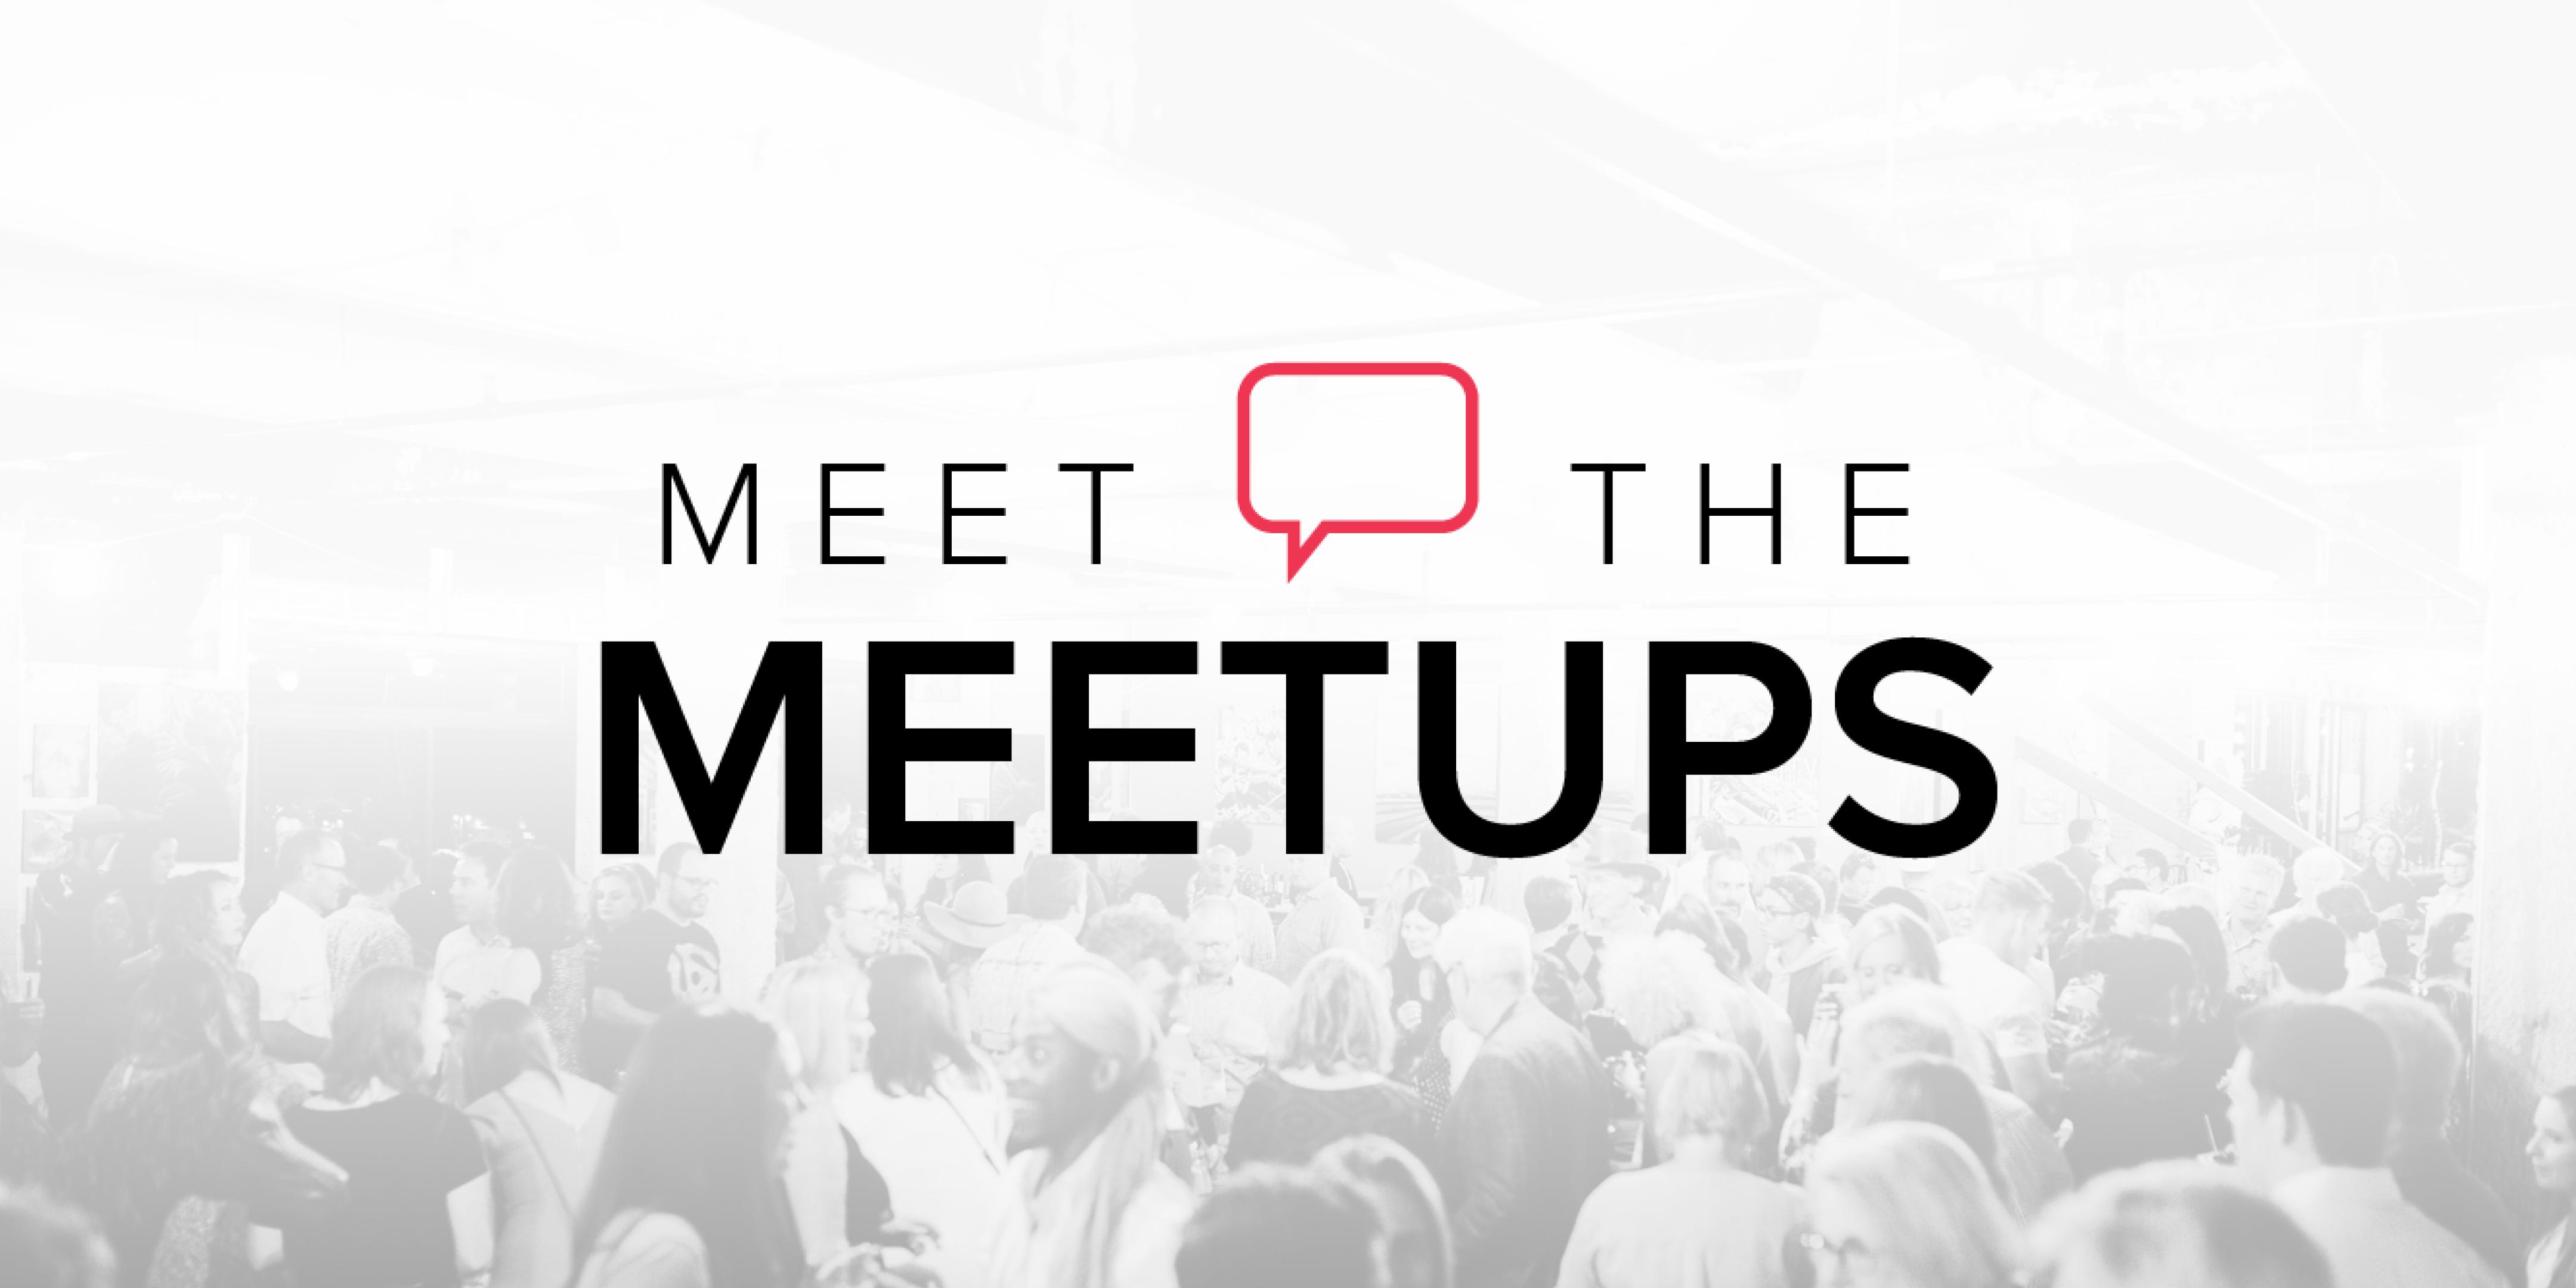 2019 meet the meetups northeast wisconsin promotional graphic